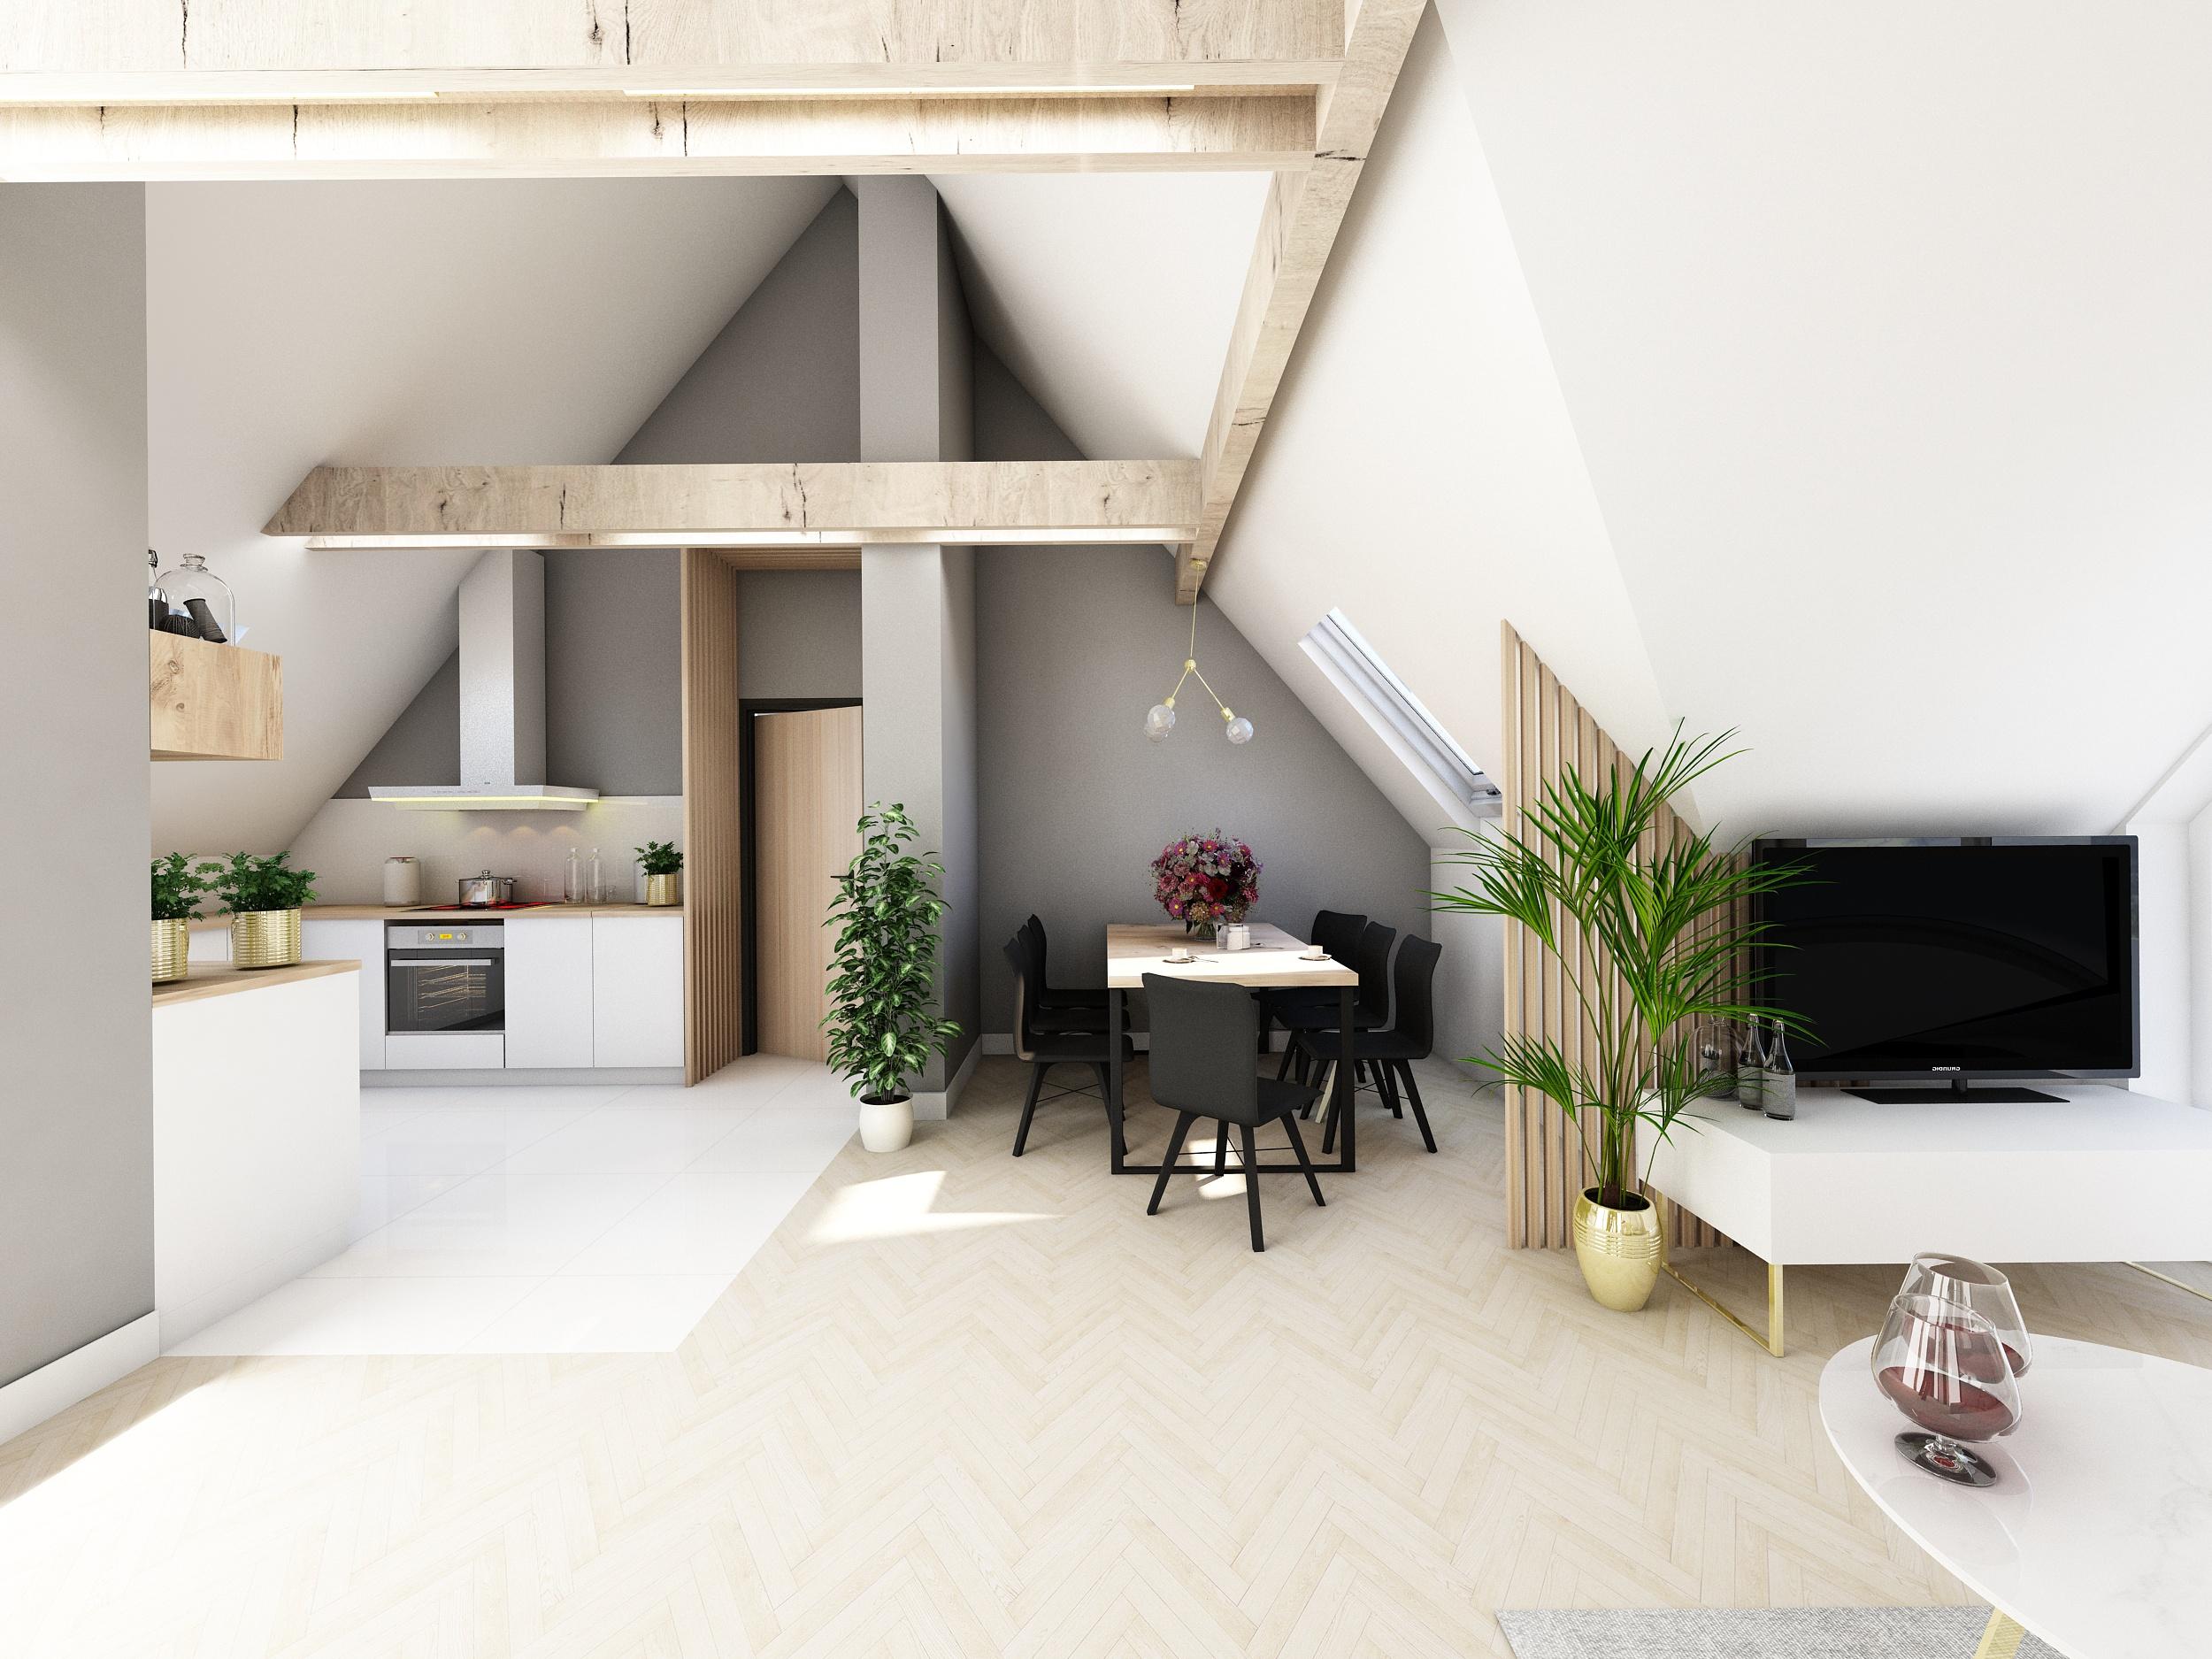 apartament zloty